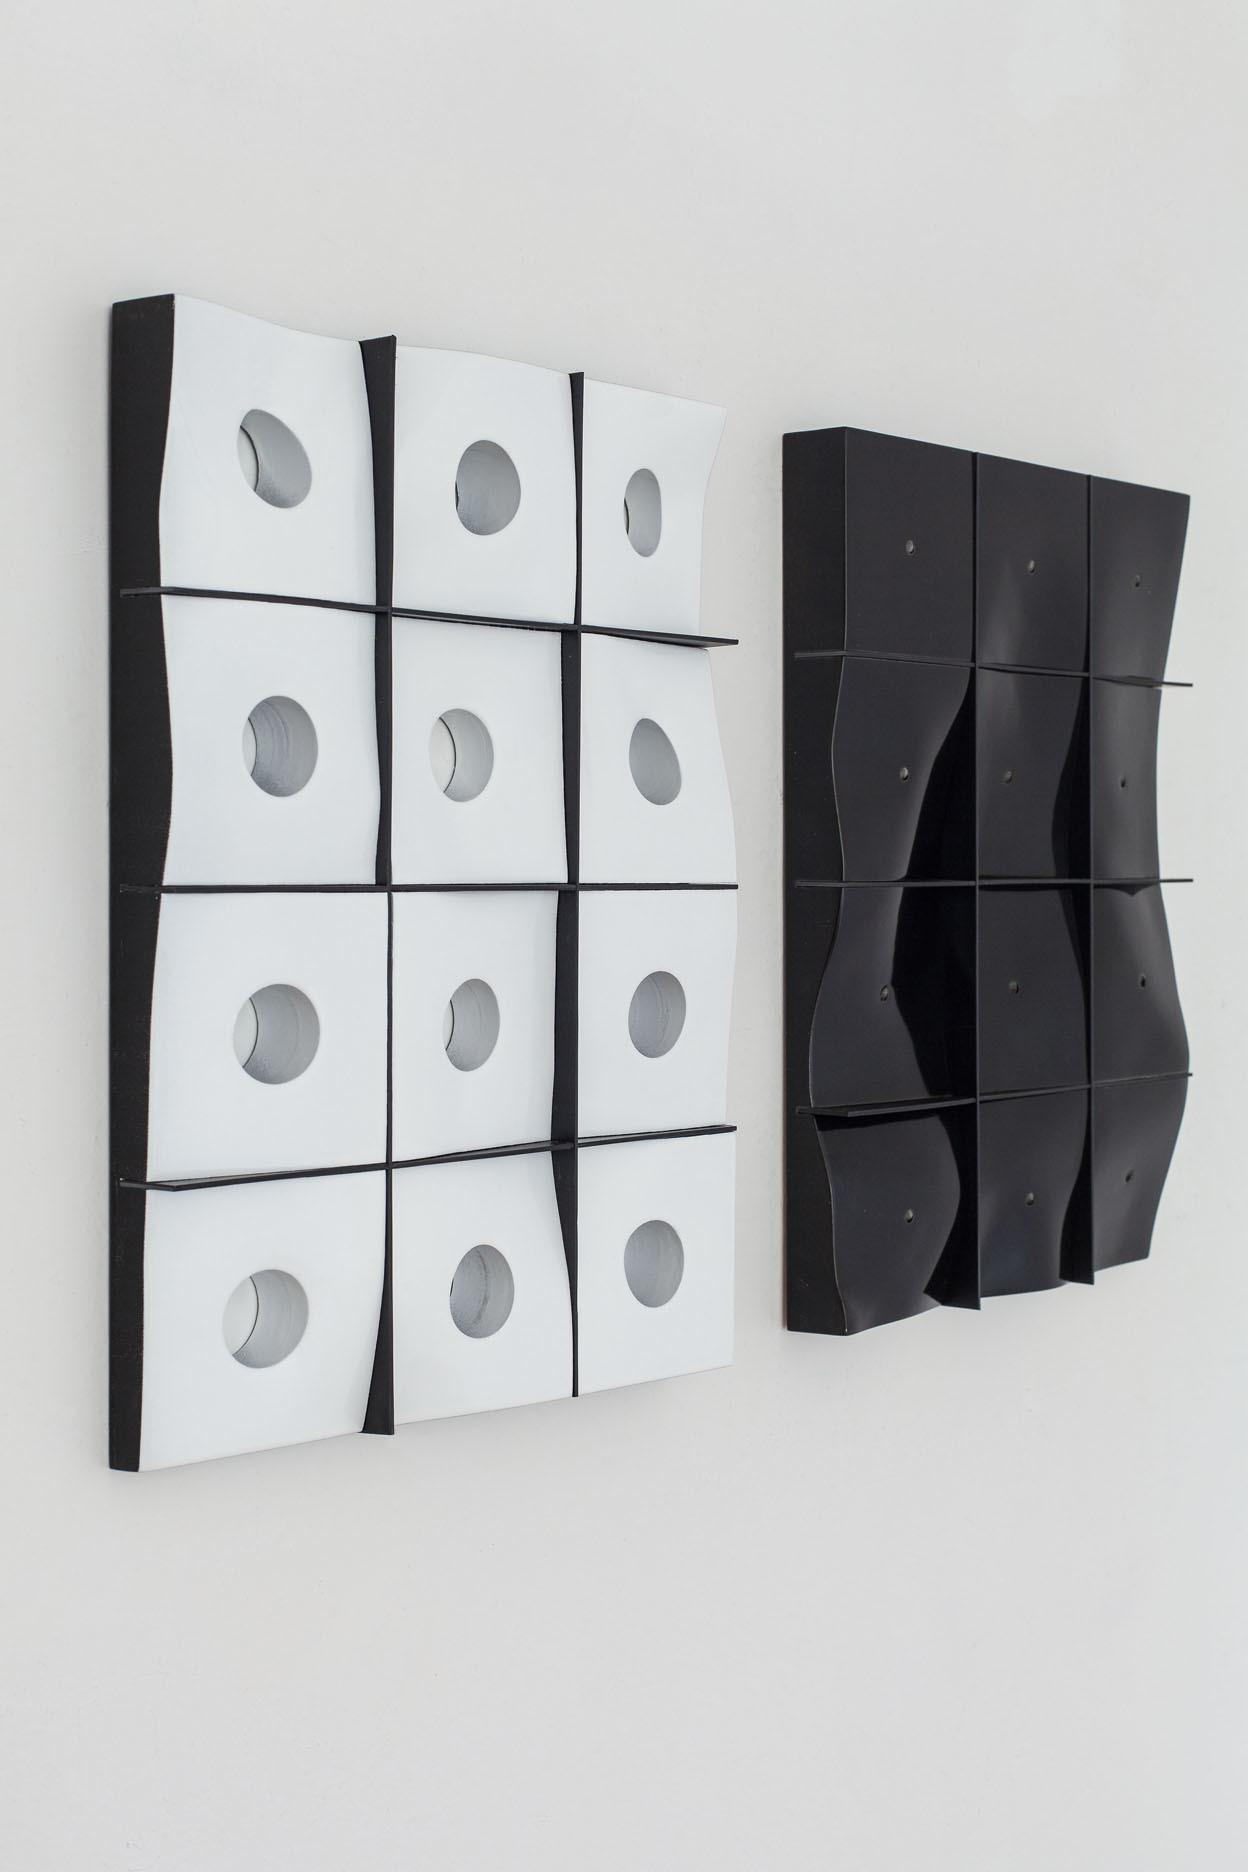 Benjamin Bronni, White Beauty, 2014, MDF, lakier, polistyren, 36 x 27 cm; Benjamin Bronni, Black Beauty, 2014, MDF, lakier, polistyren, 36 x 27 cm